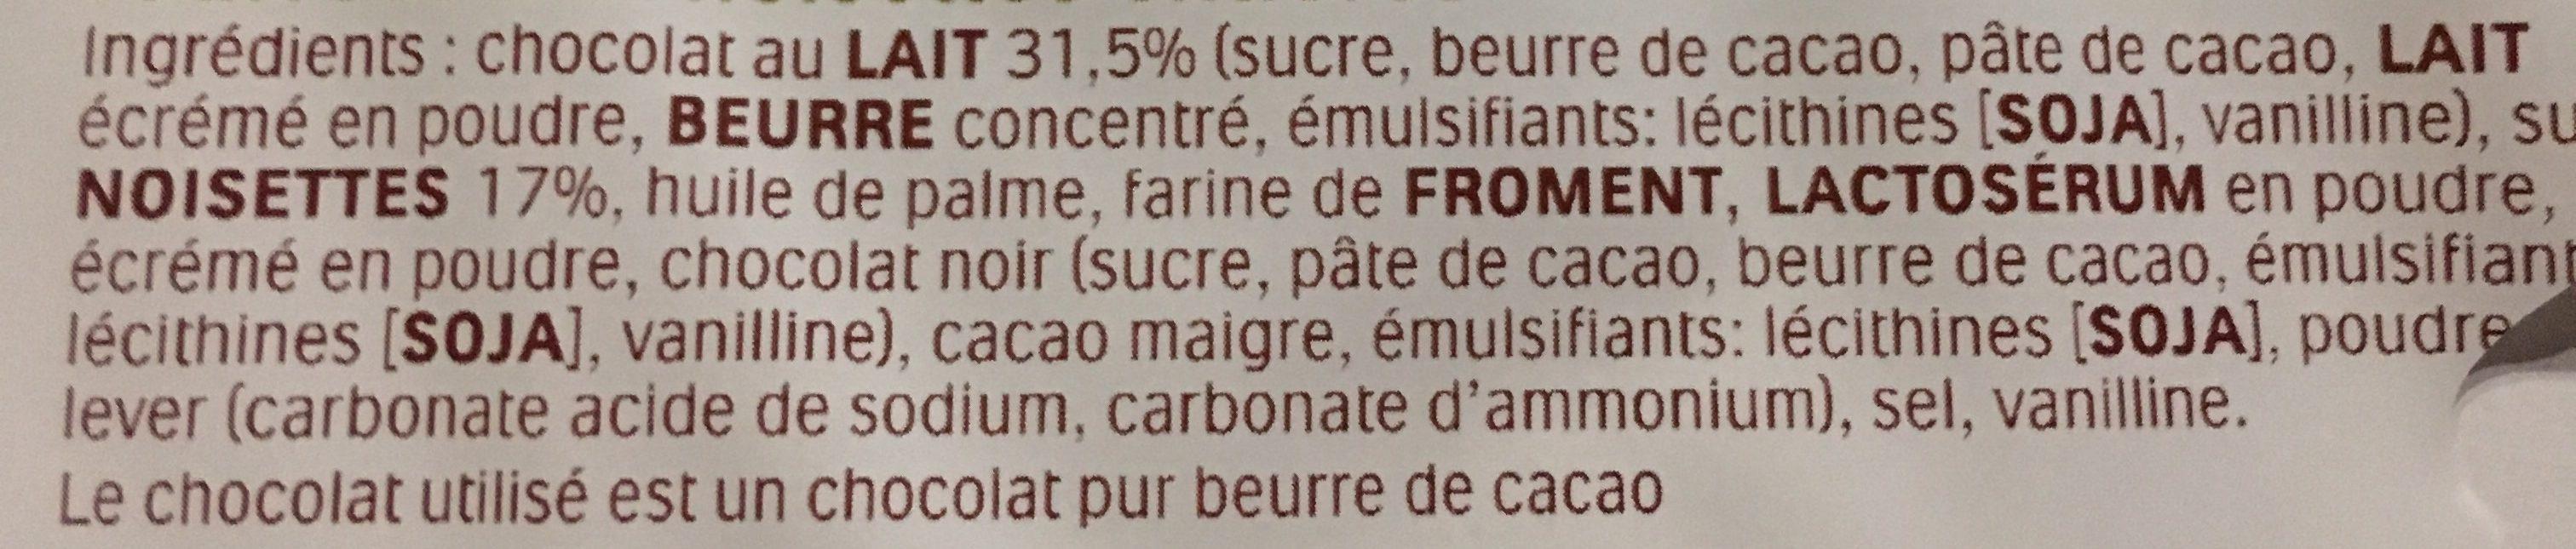 Duplo gaufrettes enrobees de chocolat fourrees noisettes entieres 5 pieces - Ingredienti - fr